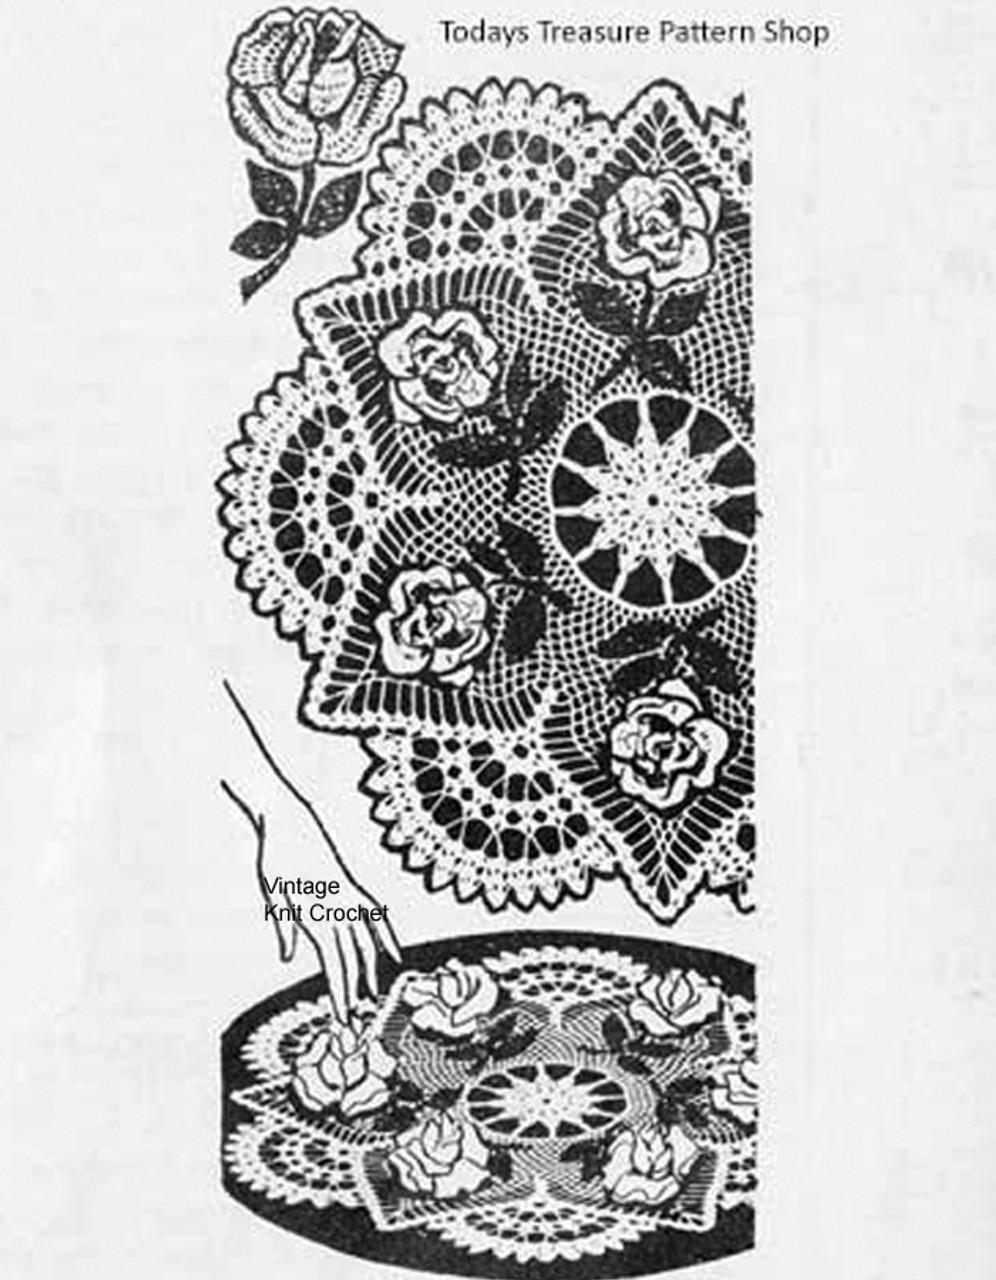 Mail Order Rose Doily Pattern 3-d, Laura Wheeler 603